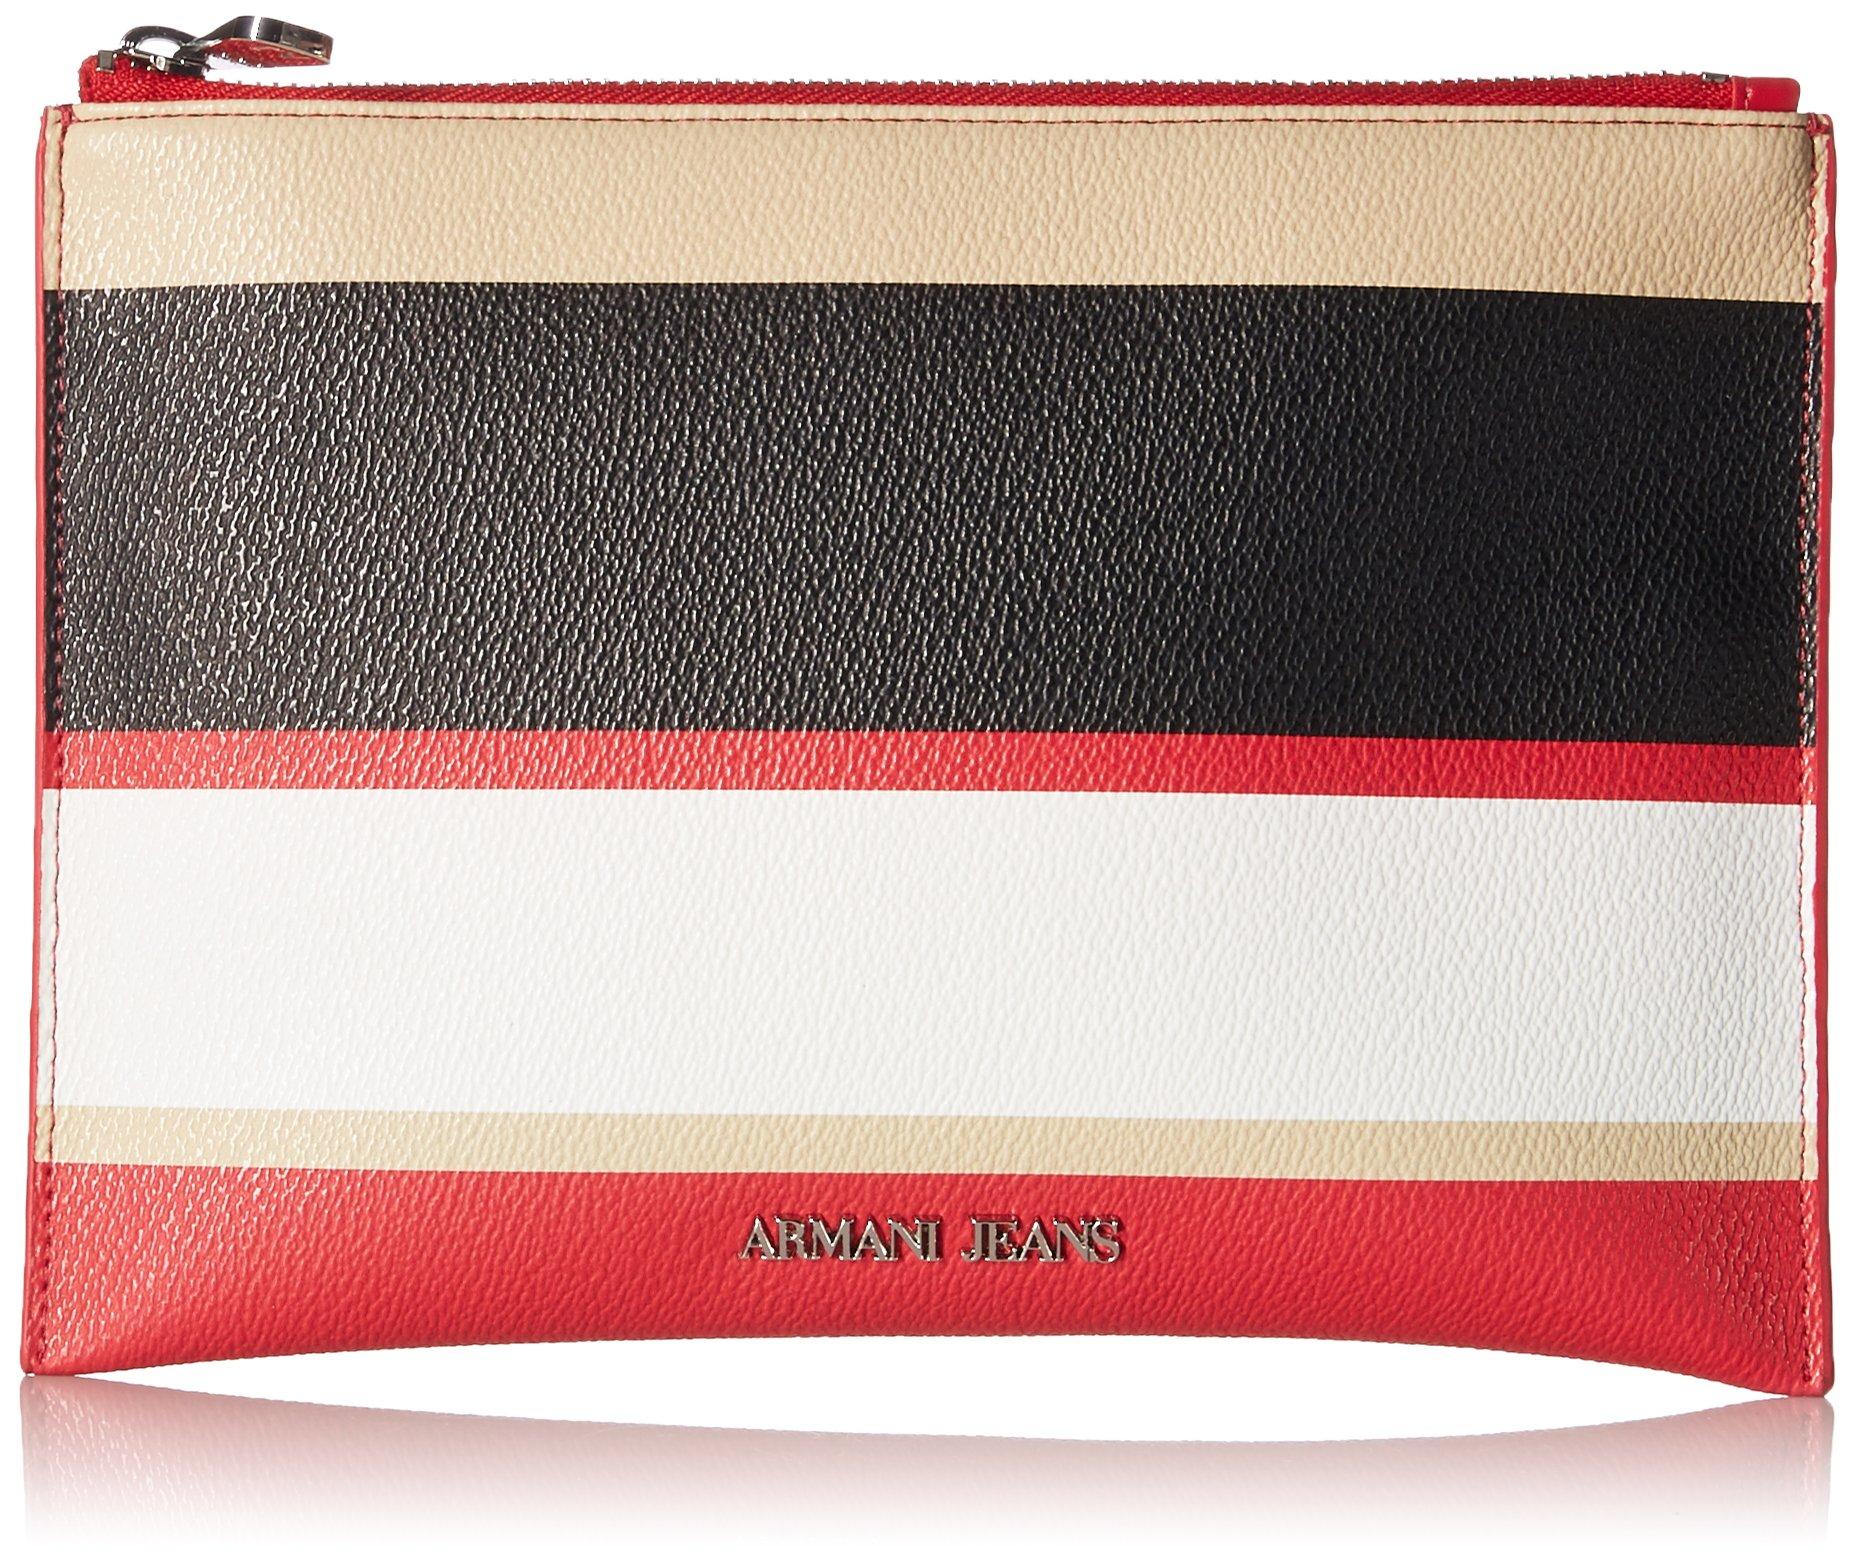 Armani Jeans Stripe Pouch 2, Red Stripe